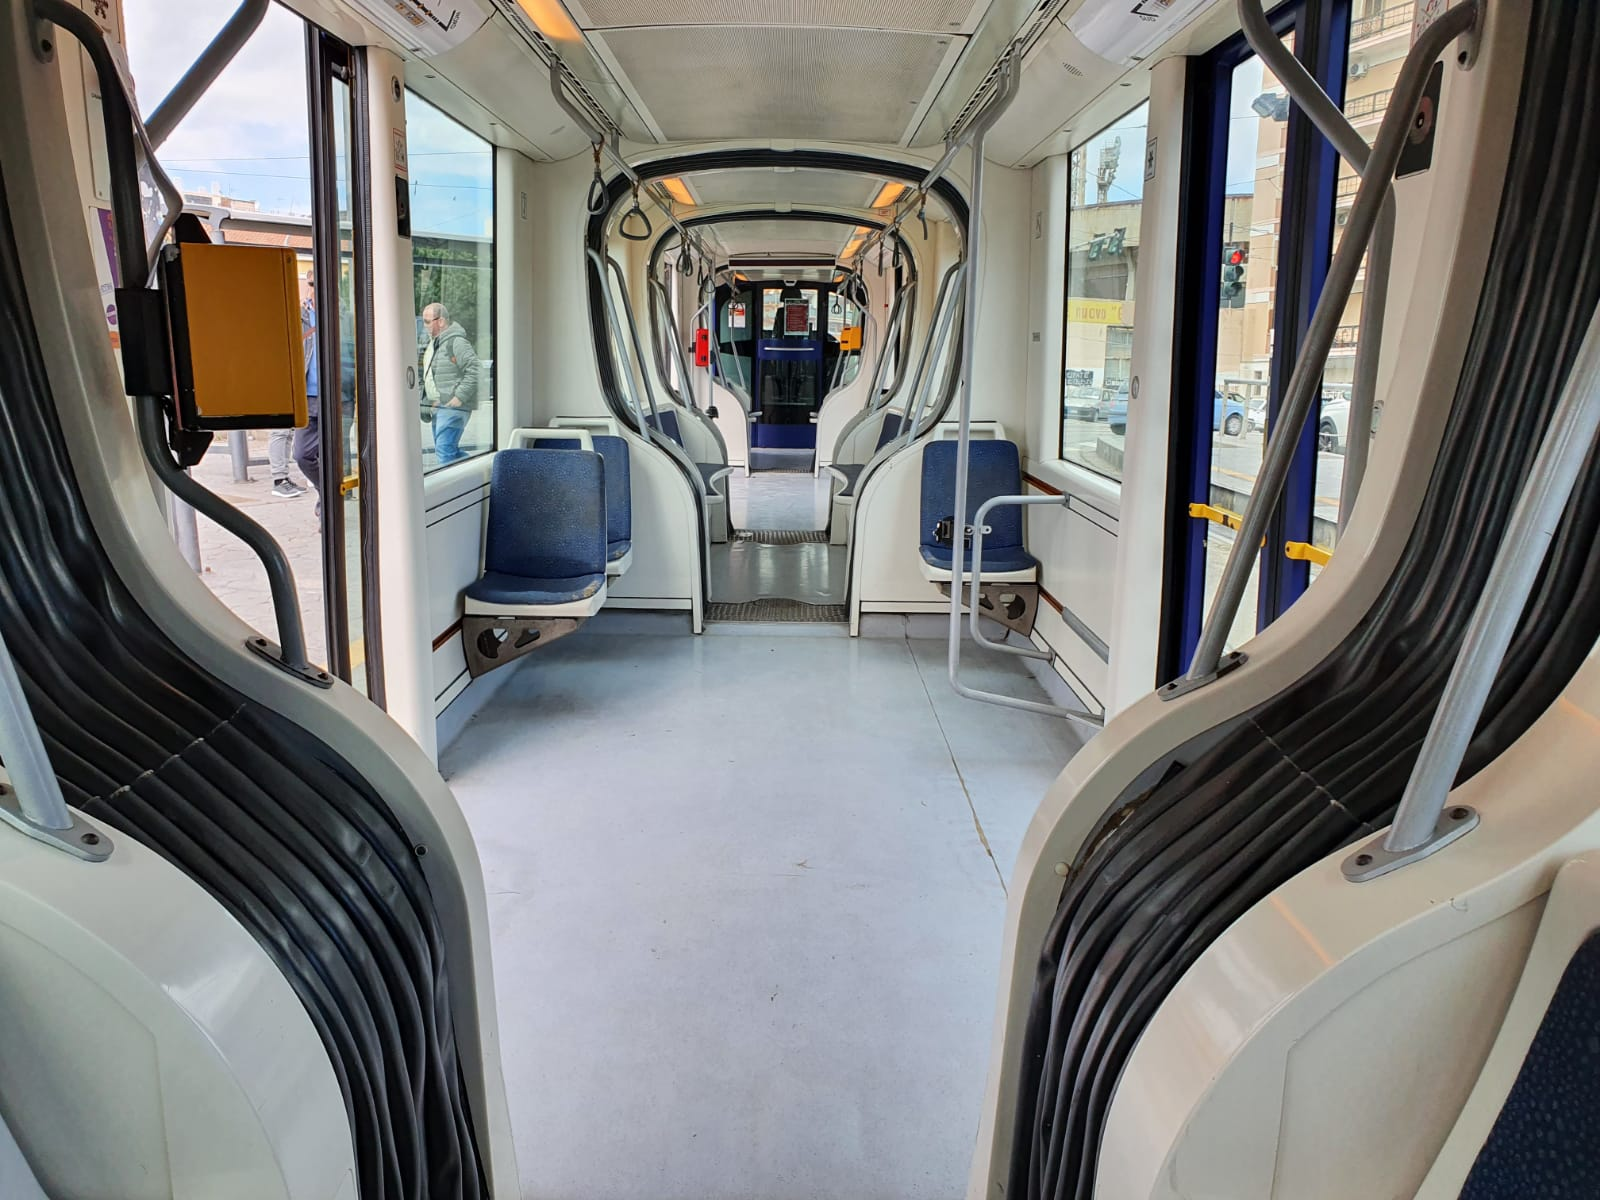 Palpeggia ragazze sul tram: 59enne finisce in manette